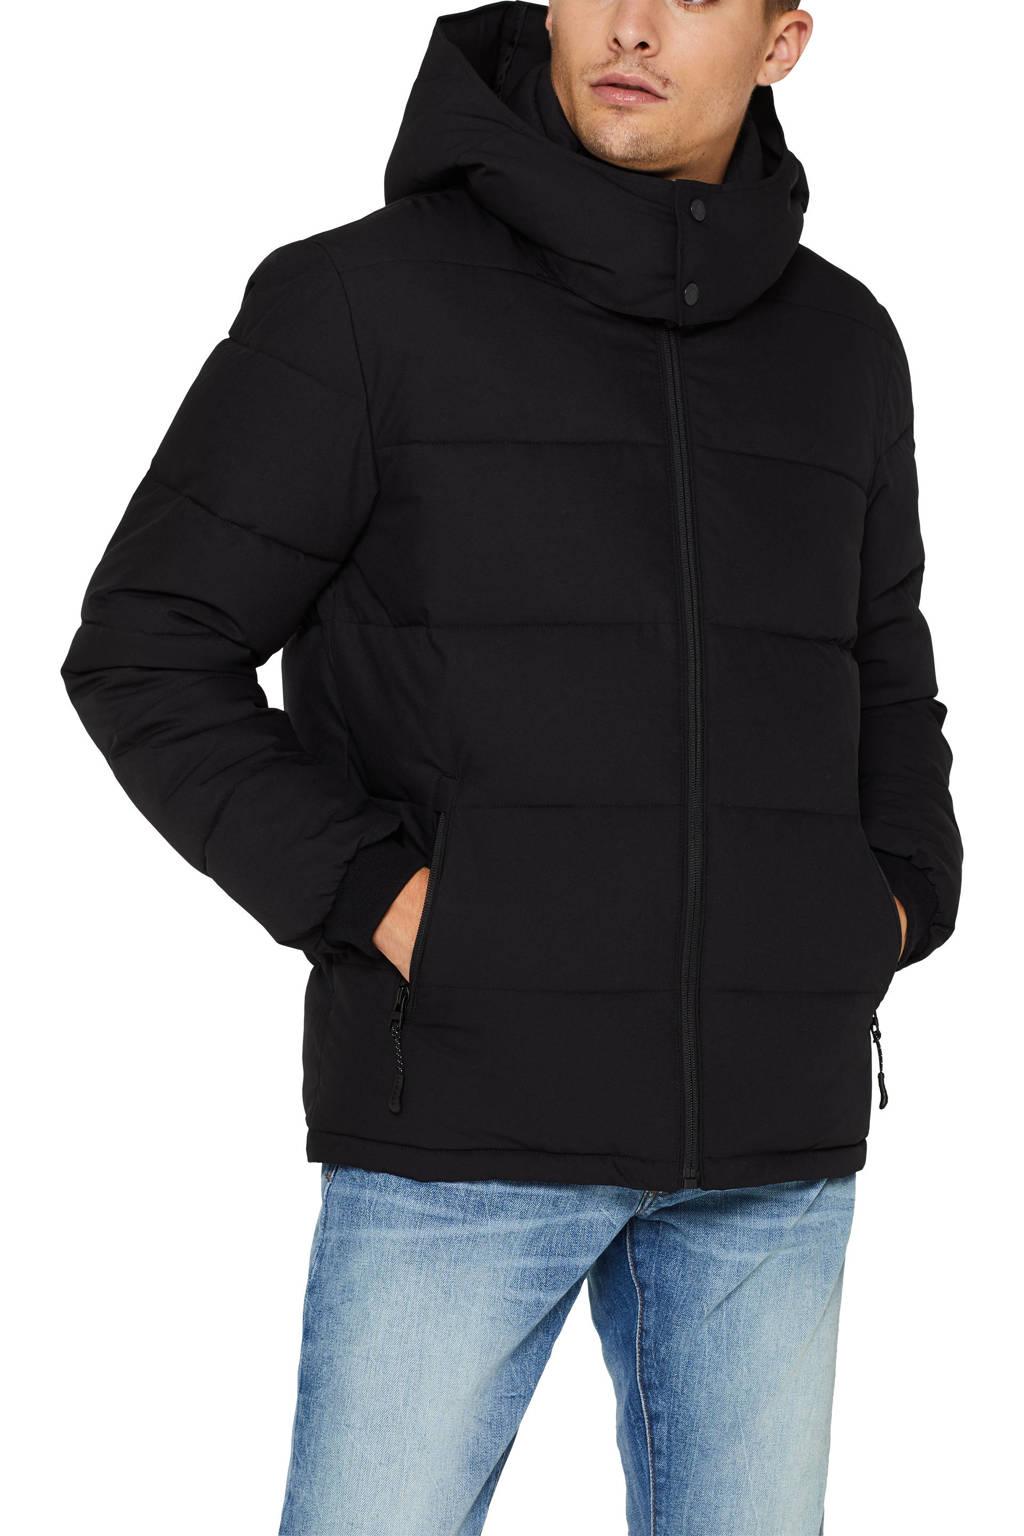 ESPRIT Men Casual jas zwart, Zwart